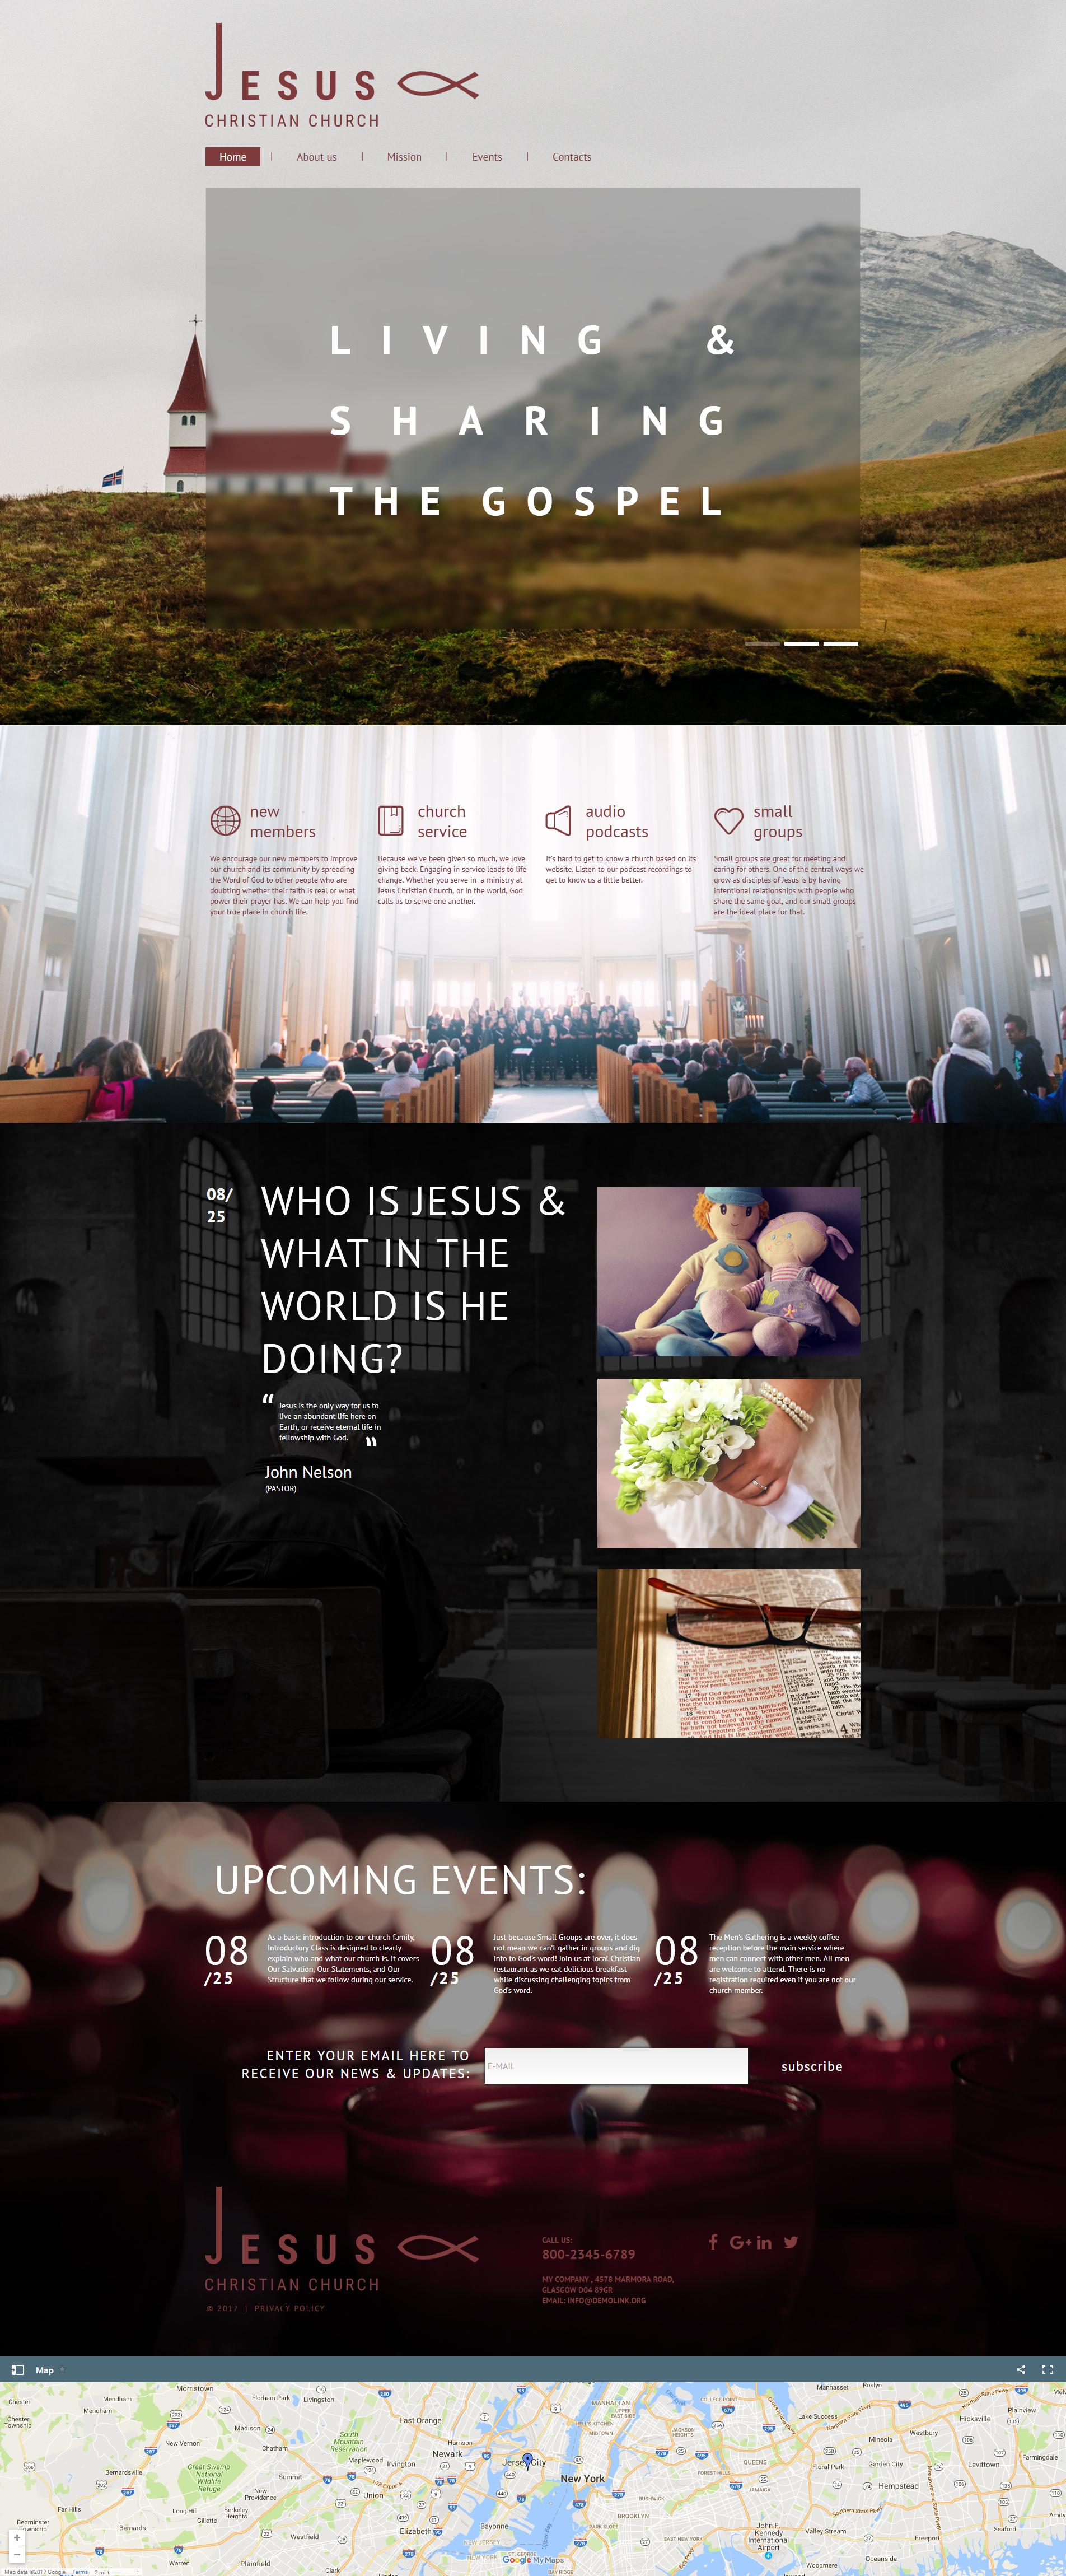 Premium Jesus - Christian Church Moto CMS HTML-mall #59306